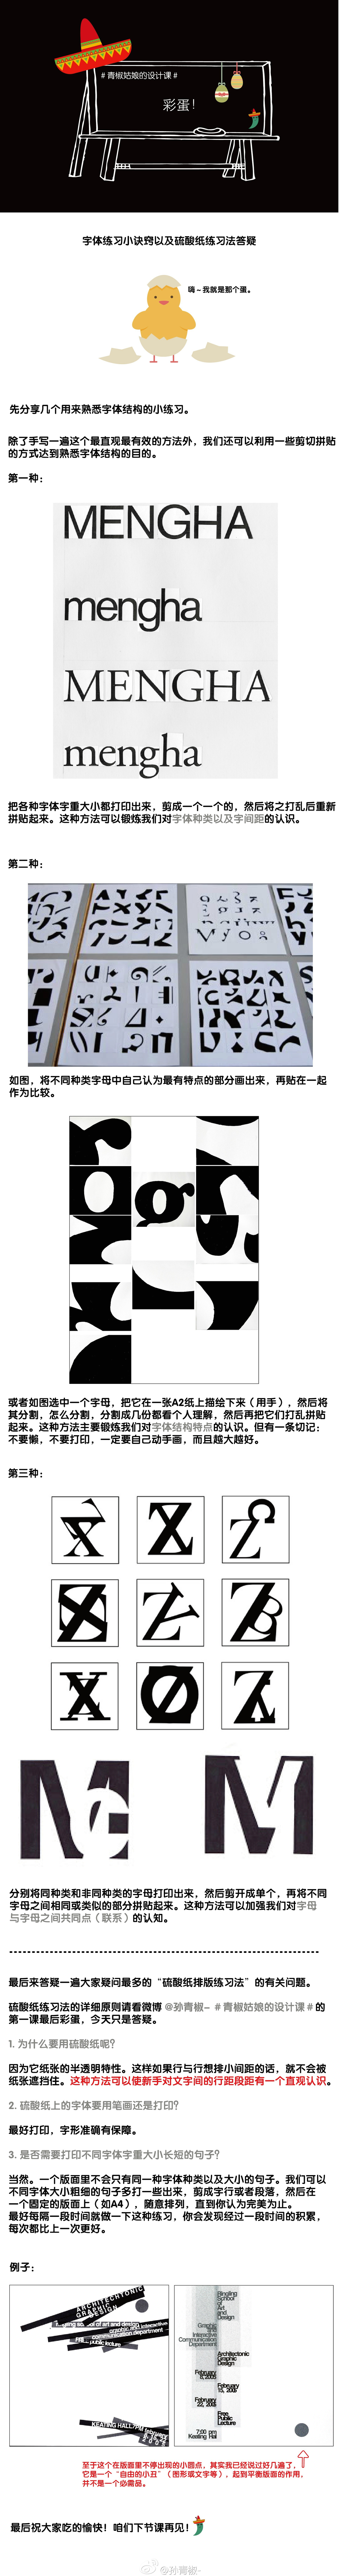 QJ20150811 (5)